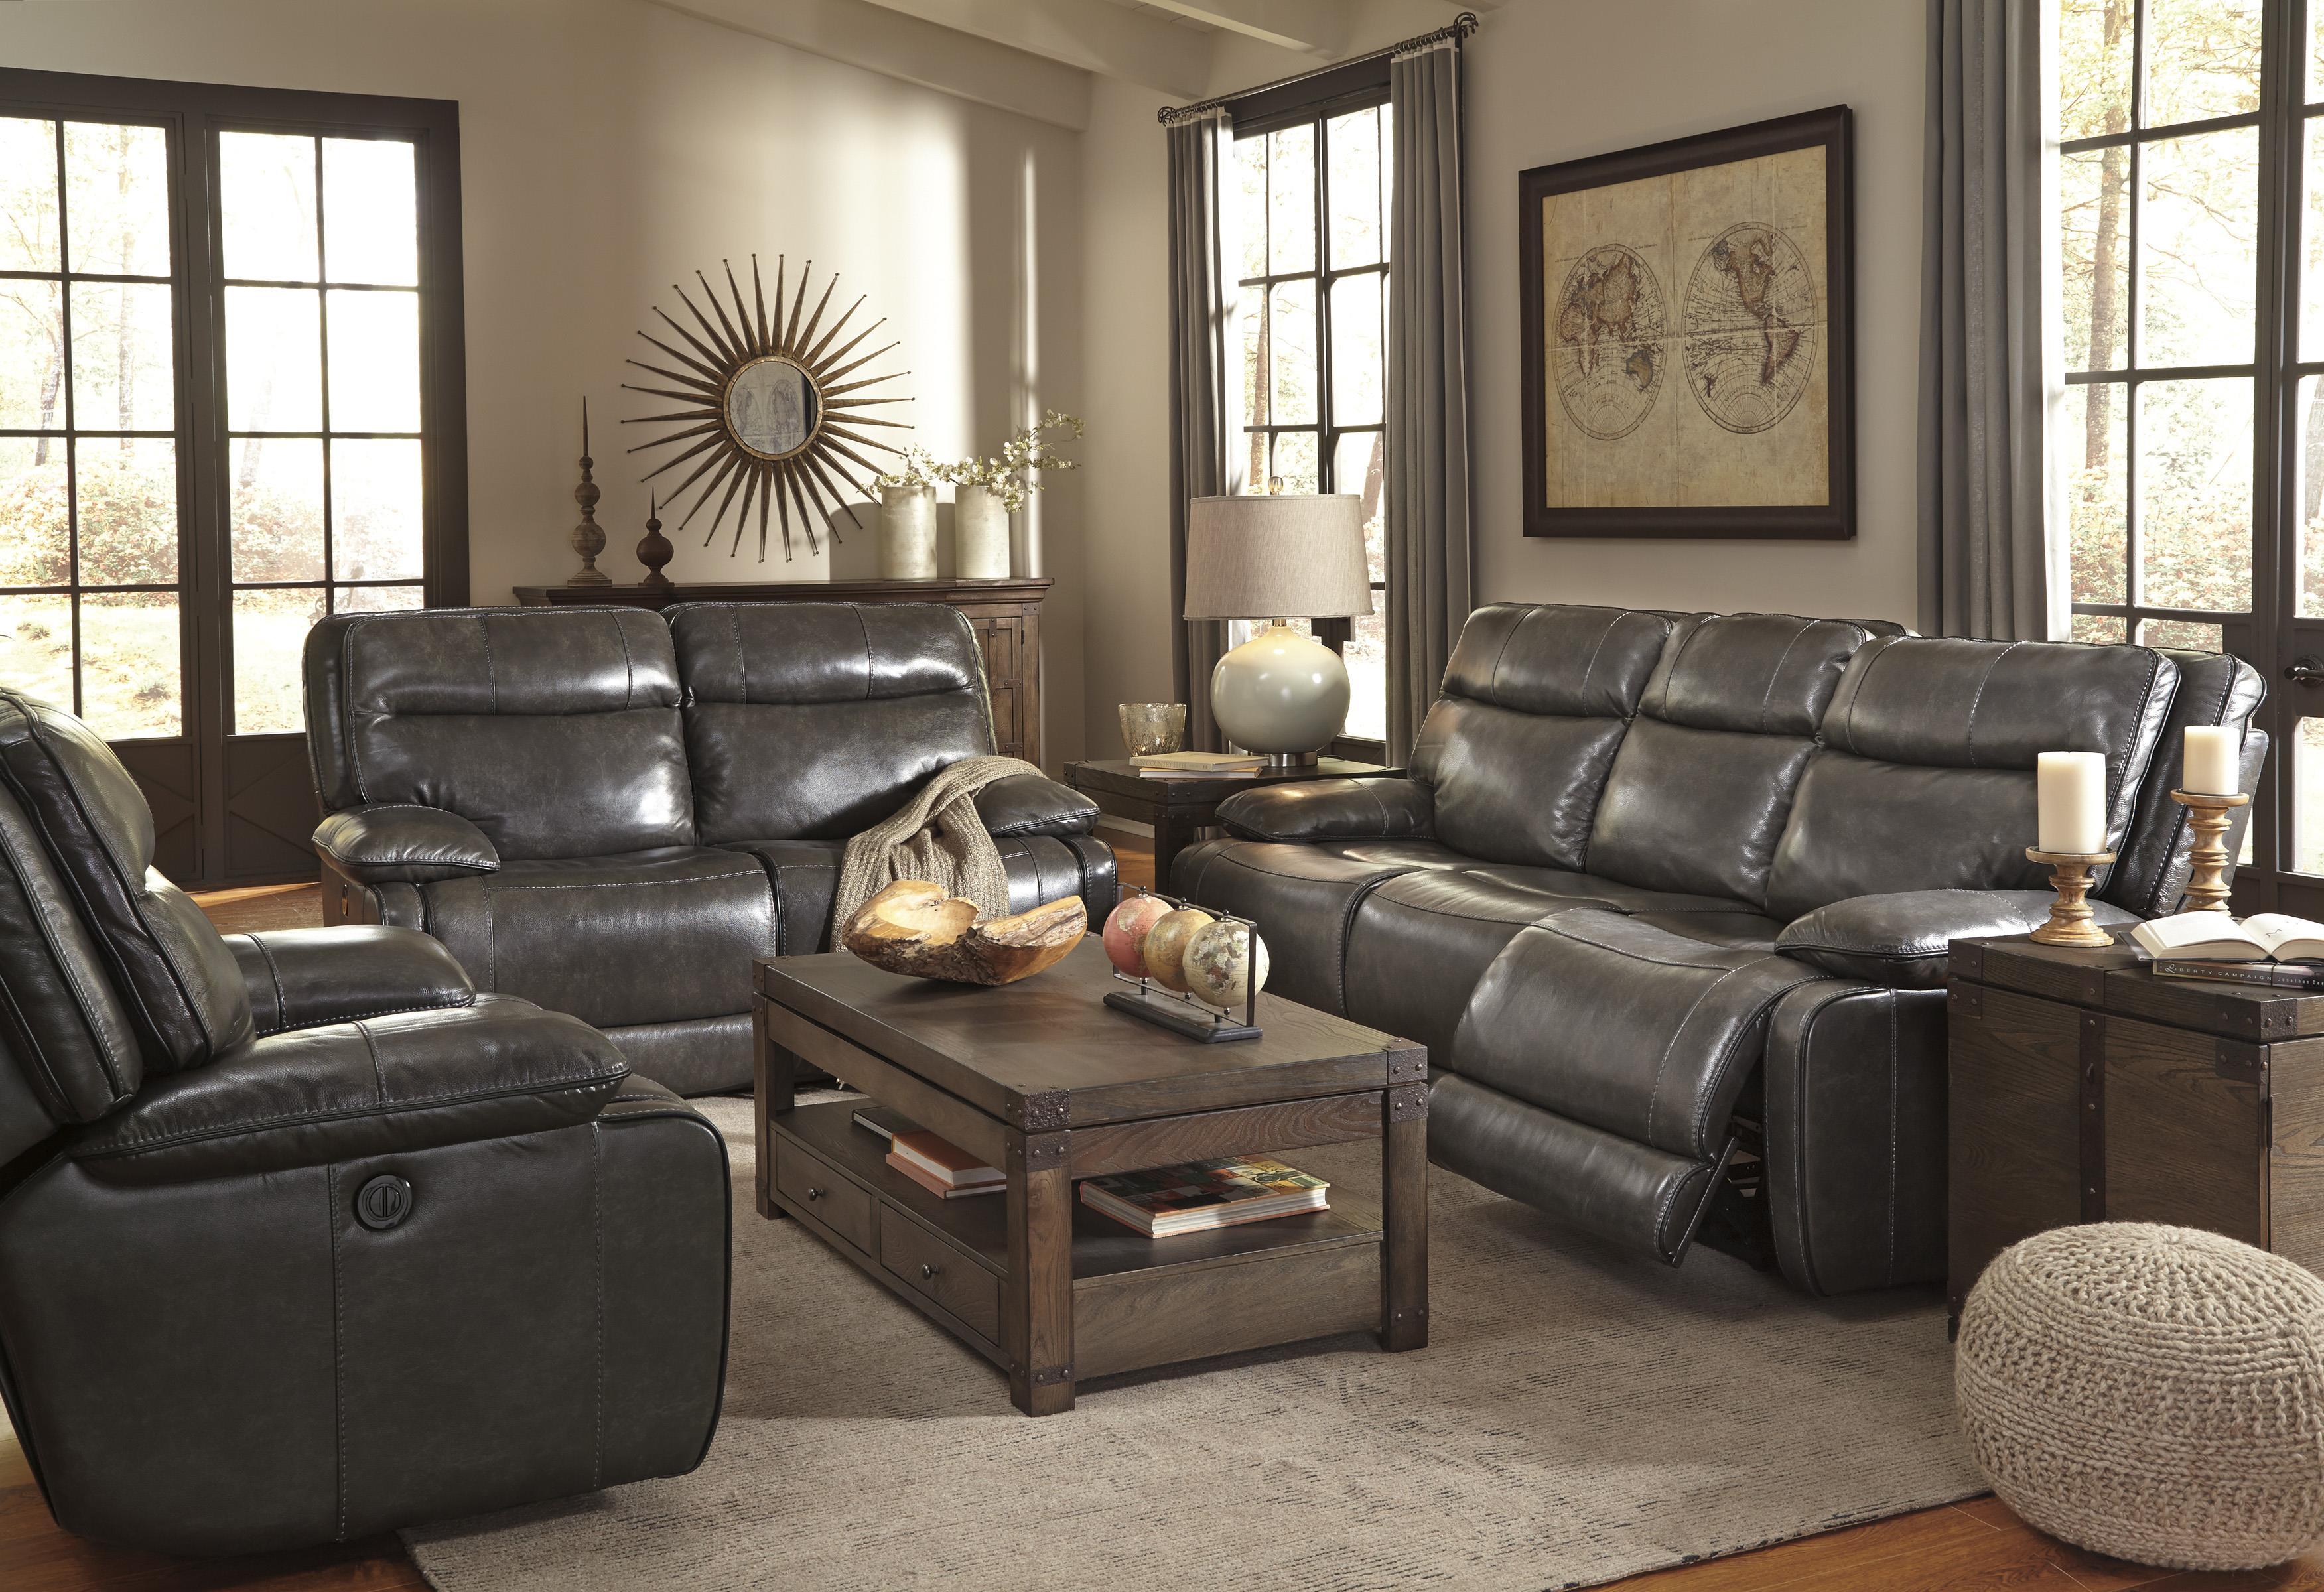 ashley signature design palladum u72601 living room group 4 reclining living room group dunk. Black Bedroom Furniture Sets. Home Design Ideas